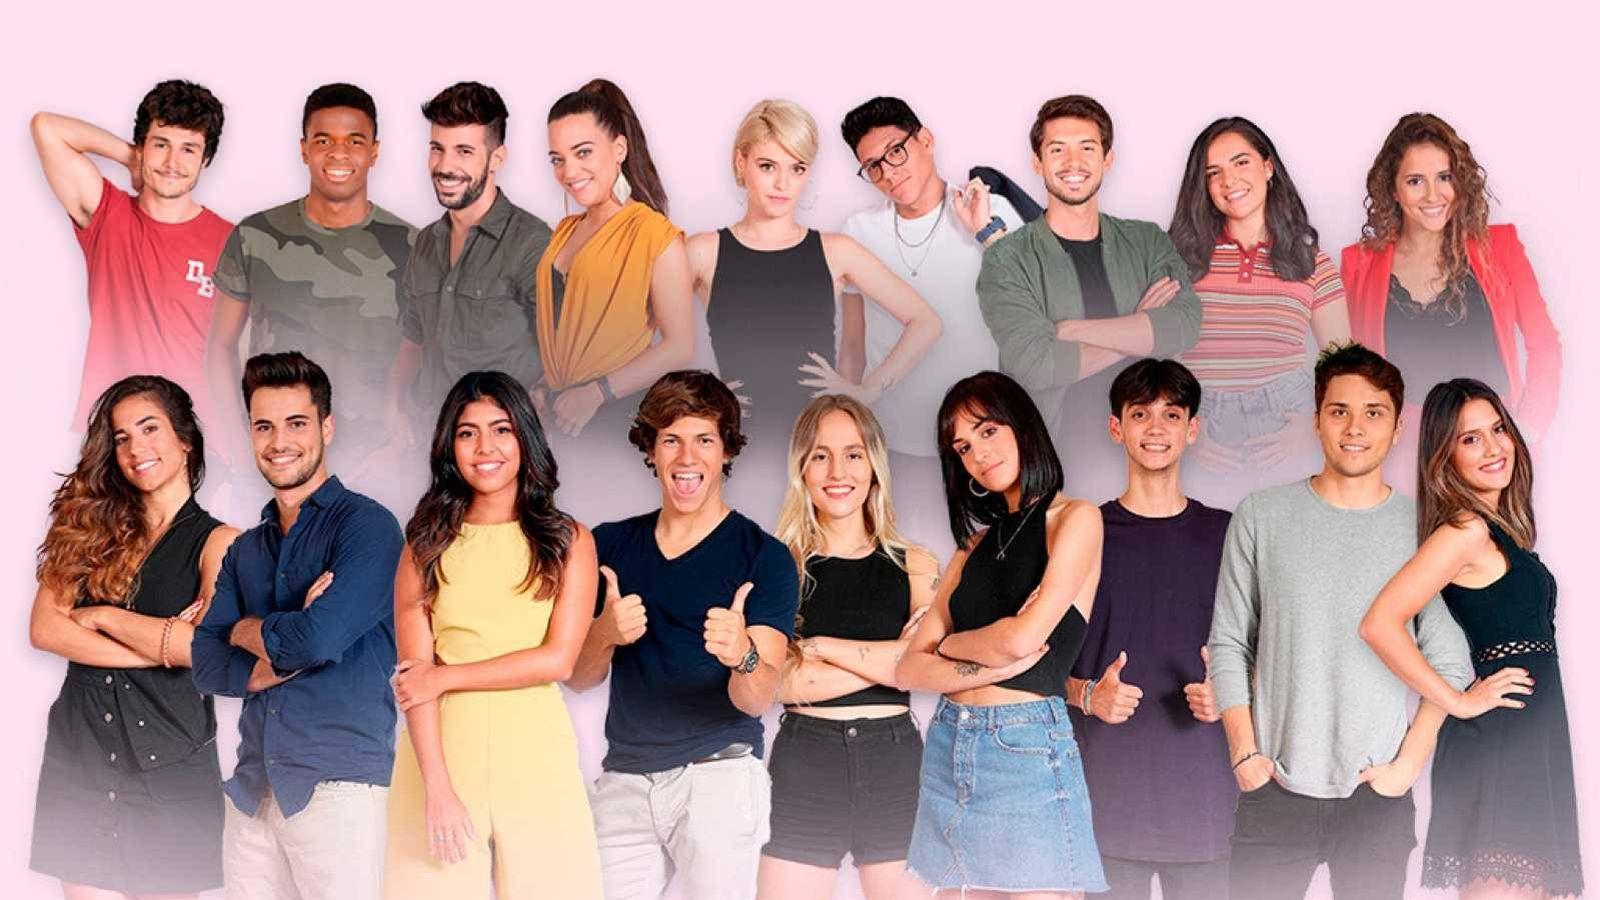 Foto: Los 18 aspirantes de 'OT 2018' que actuaron en la gala 0. (TVE)